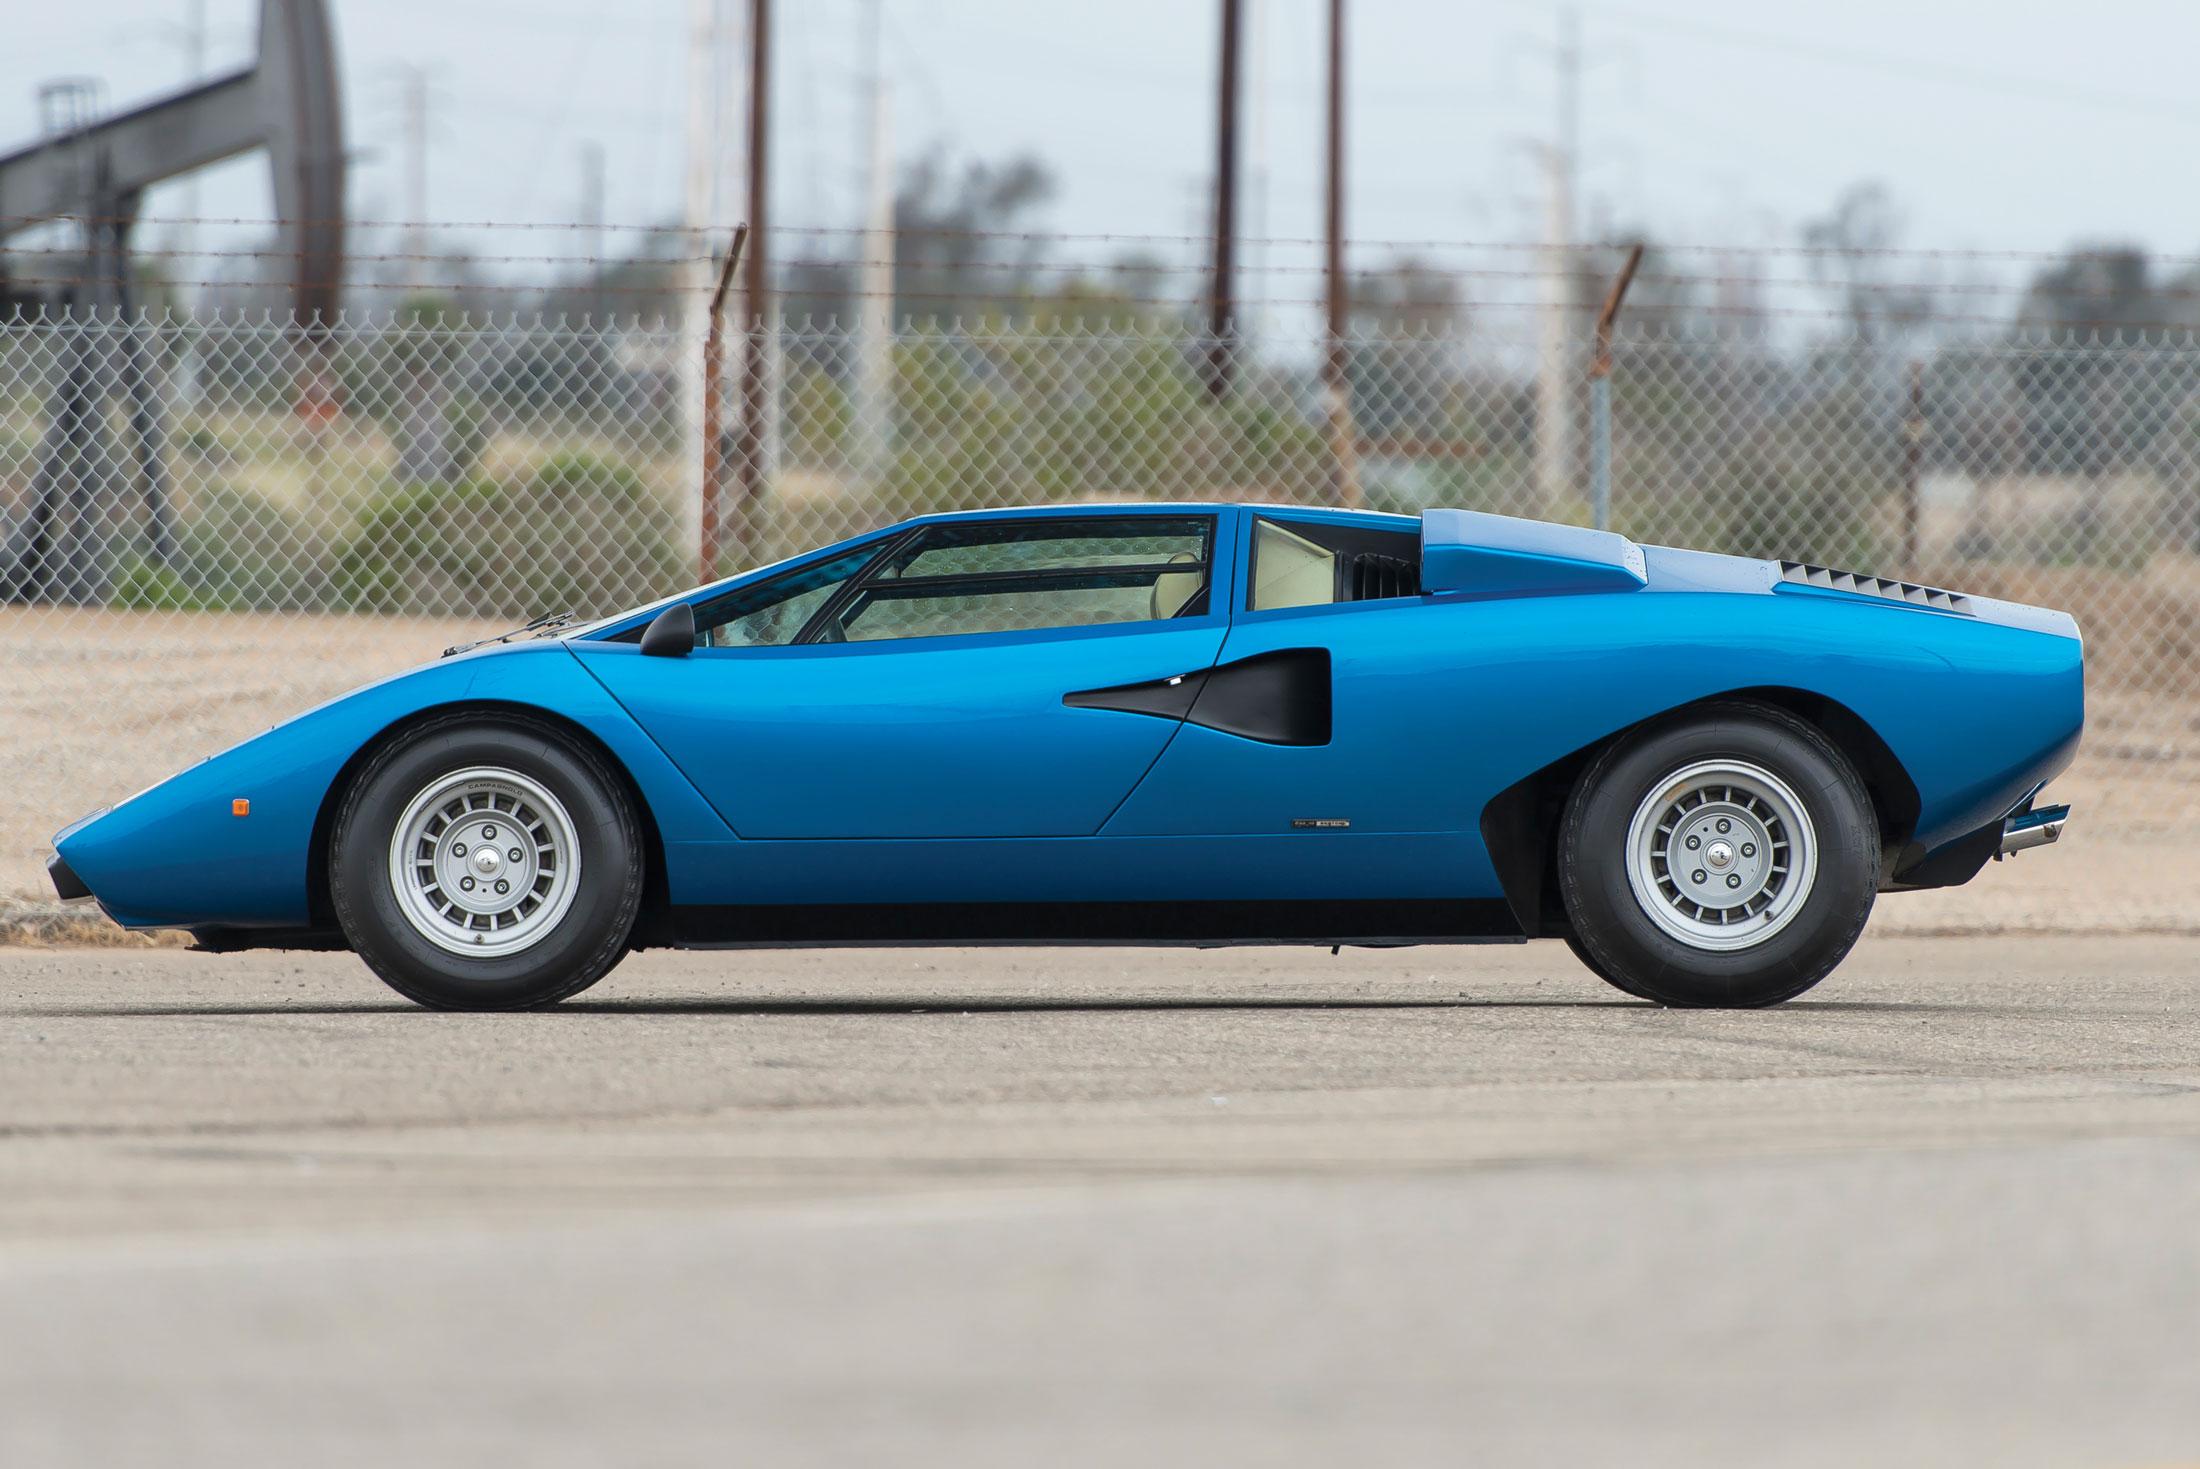 1976 Lamborghini Countach LP 400 'Periscopio' | RM Sotheby's | Estimate: $2 Million